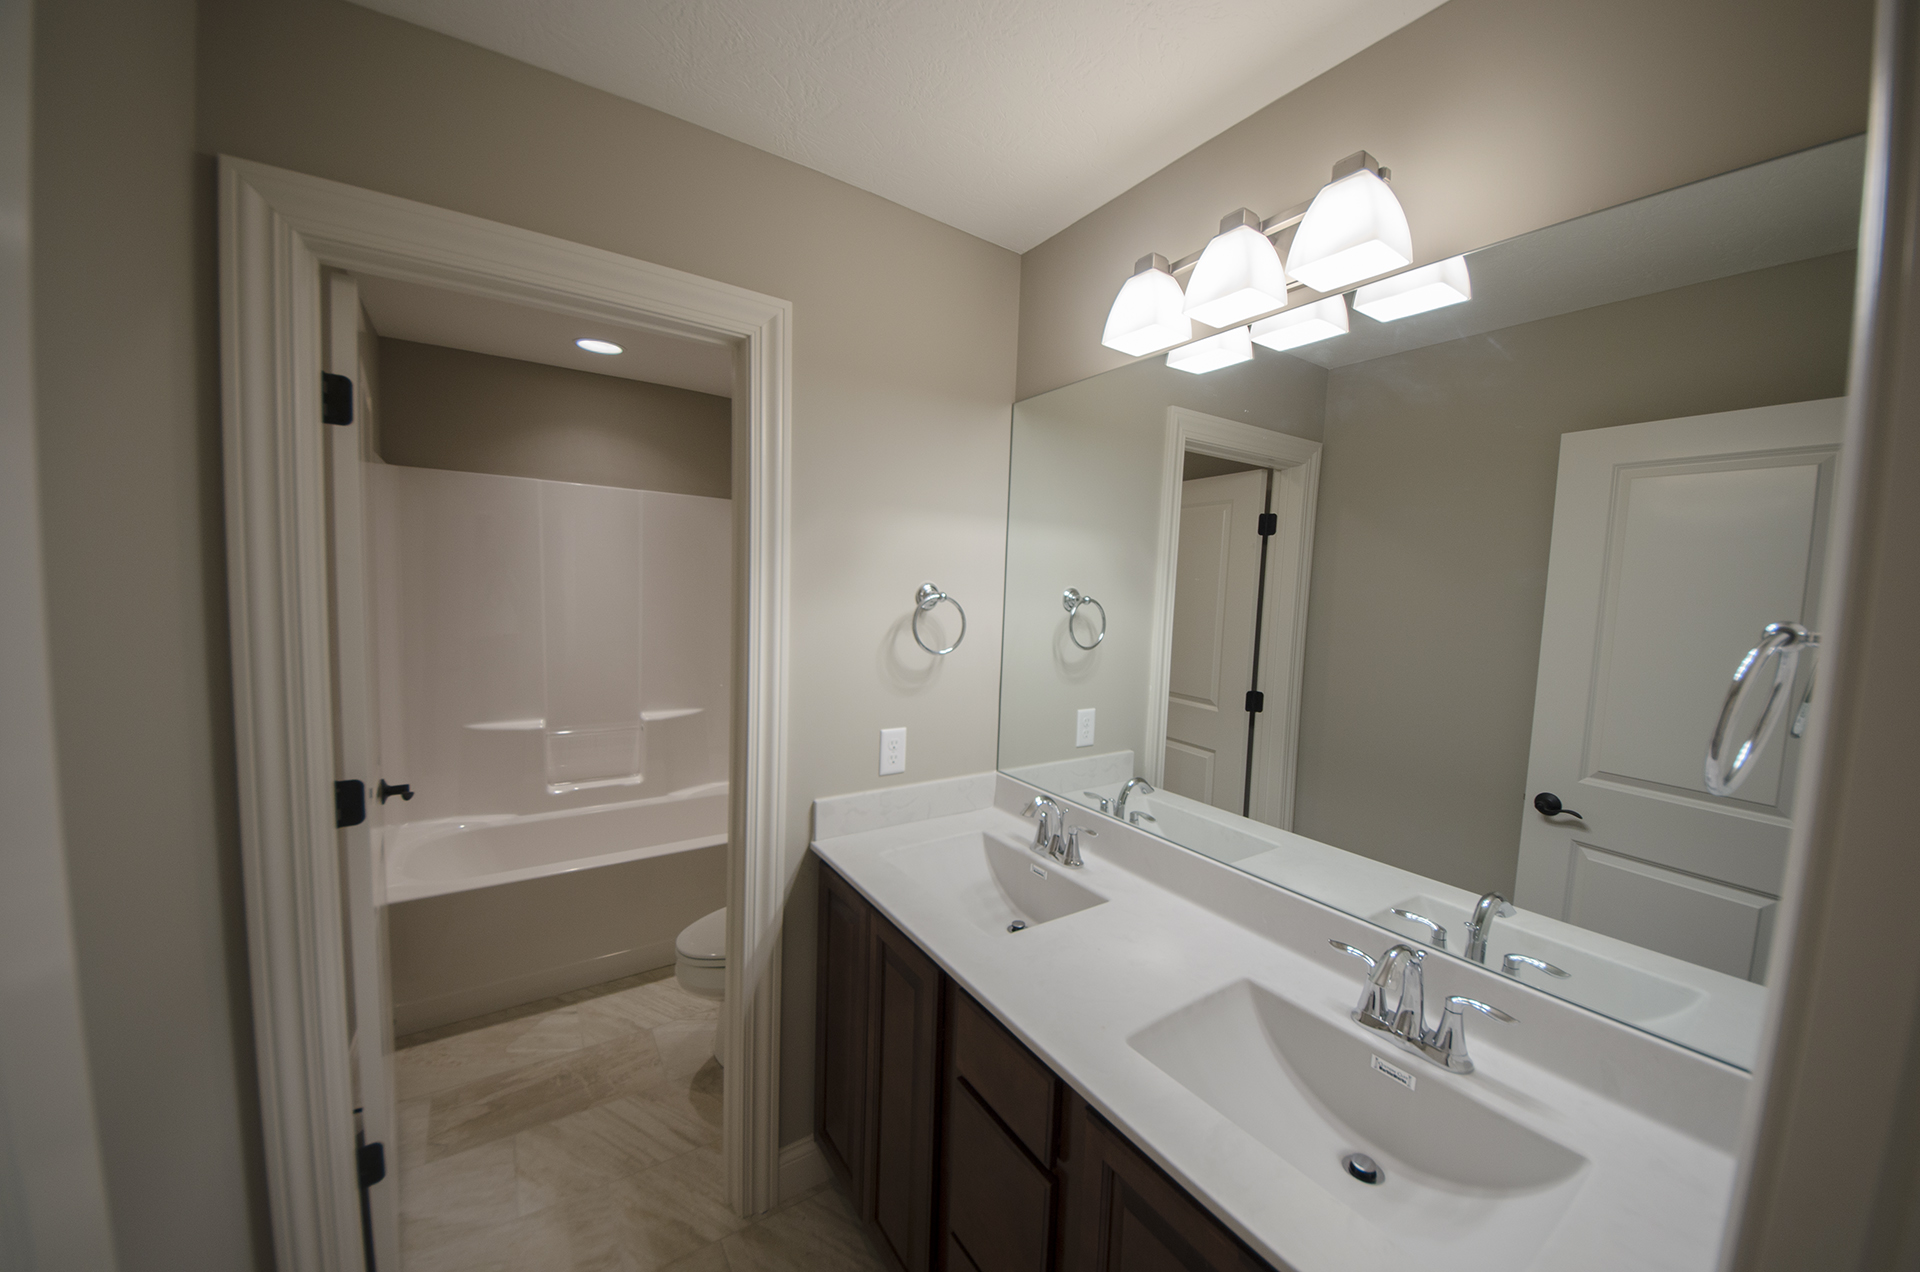 22 Awesome Bathroom Fixtures Dayton Ohio